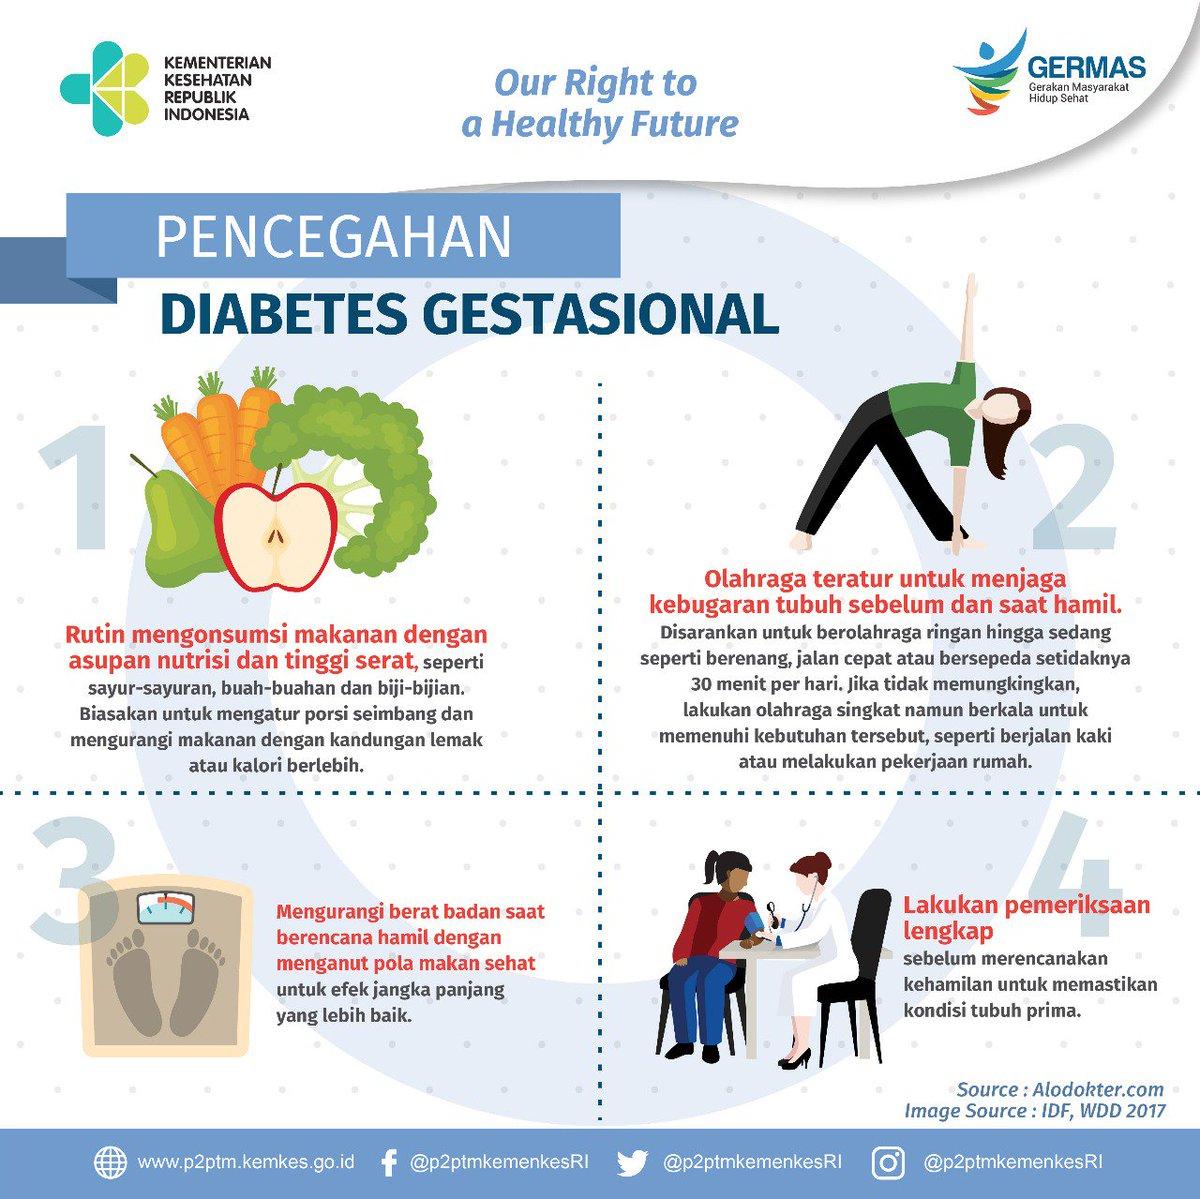 pencegahan diabetes melitus gestacional